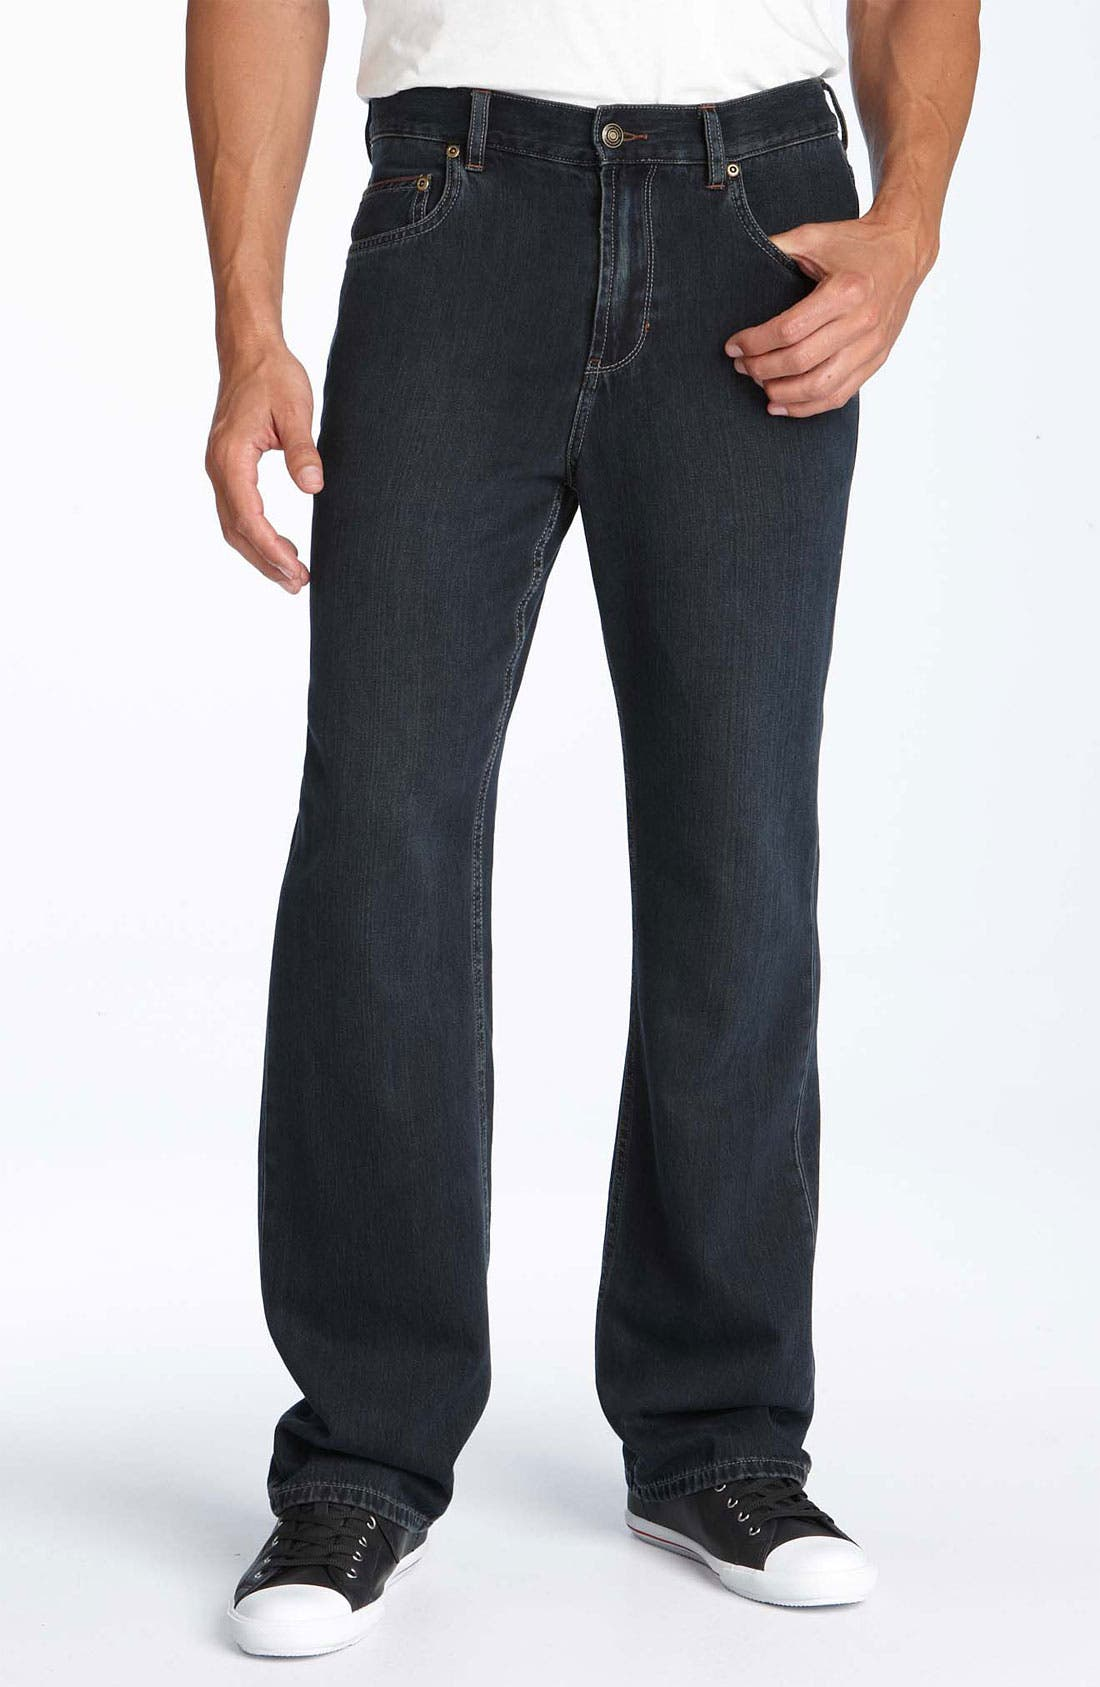 Alternate Image 1 Selected - Tommy Bahama Denim 'Island Ease' Straight Leg Jeans (Black Overdye)